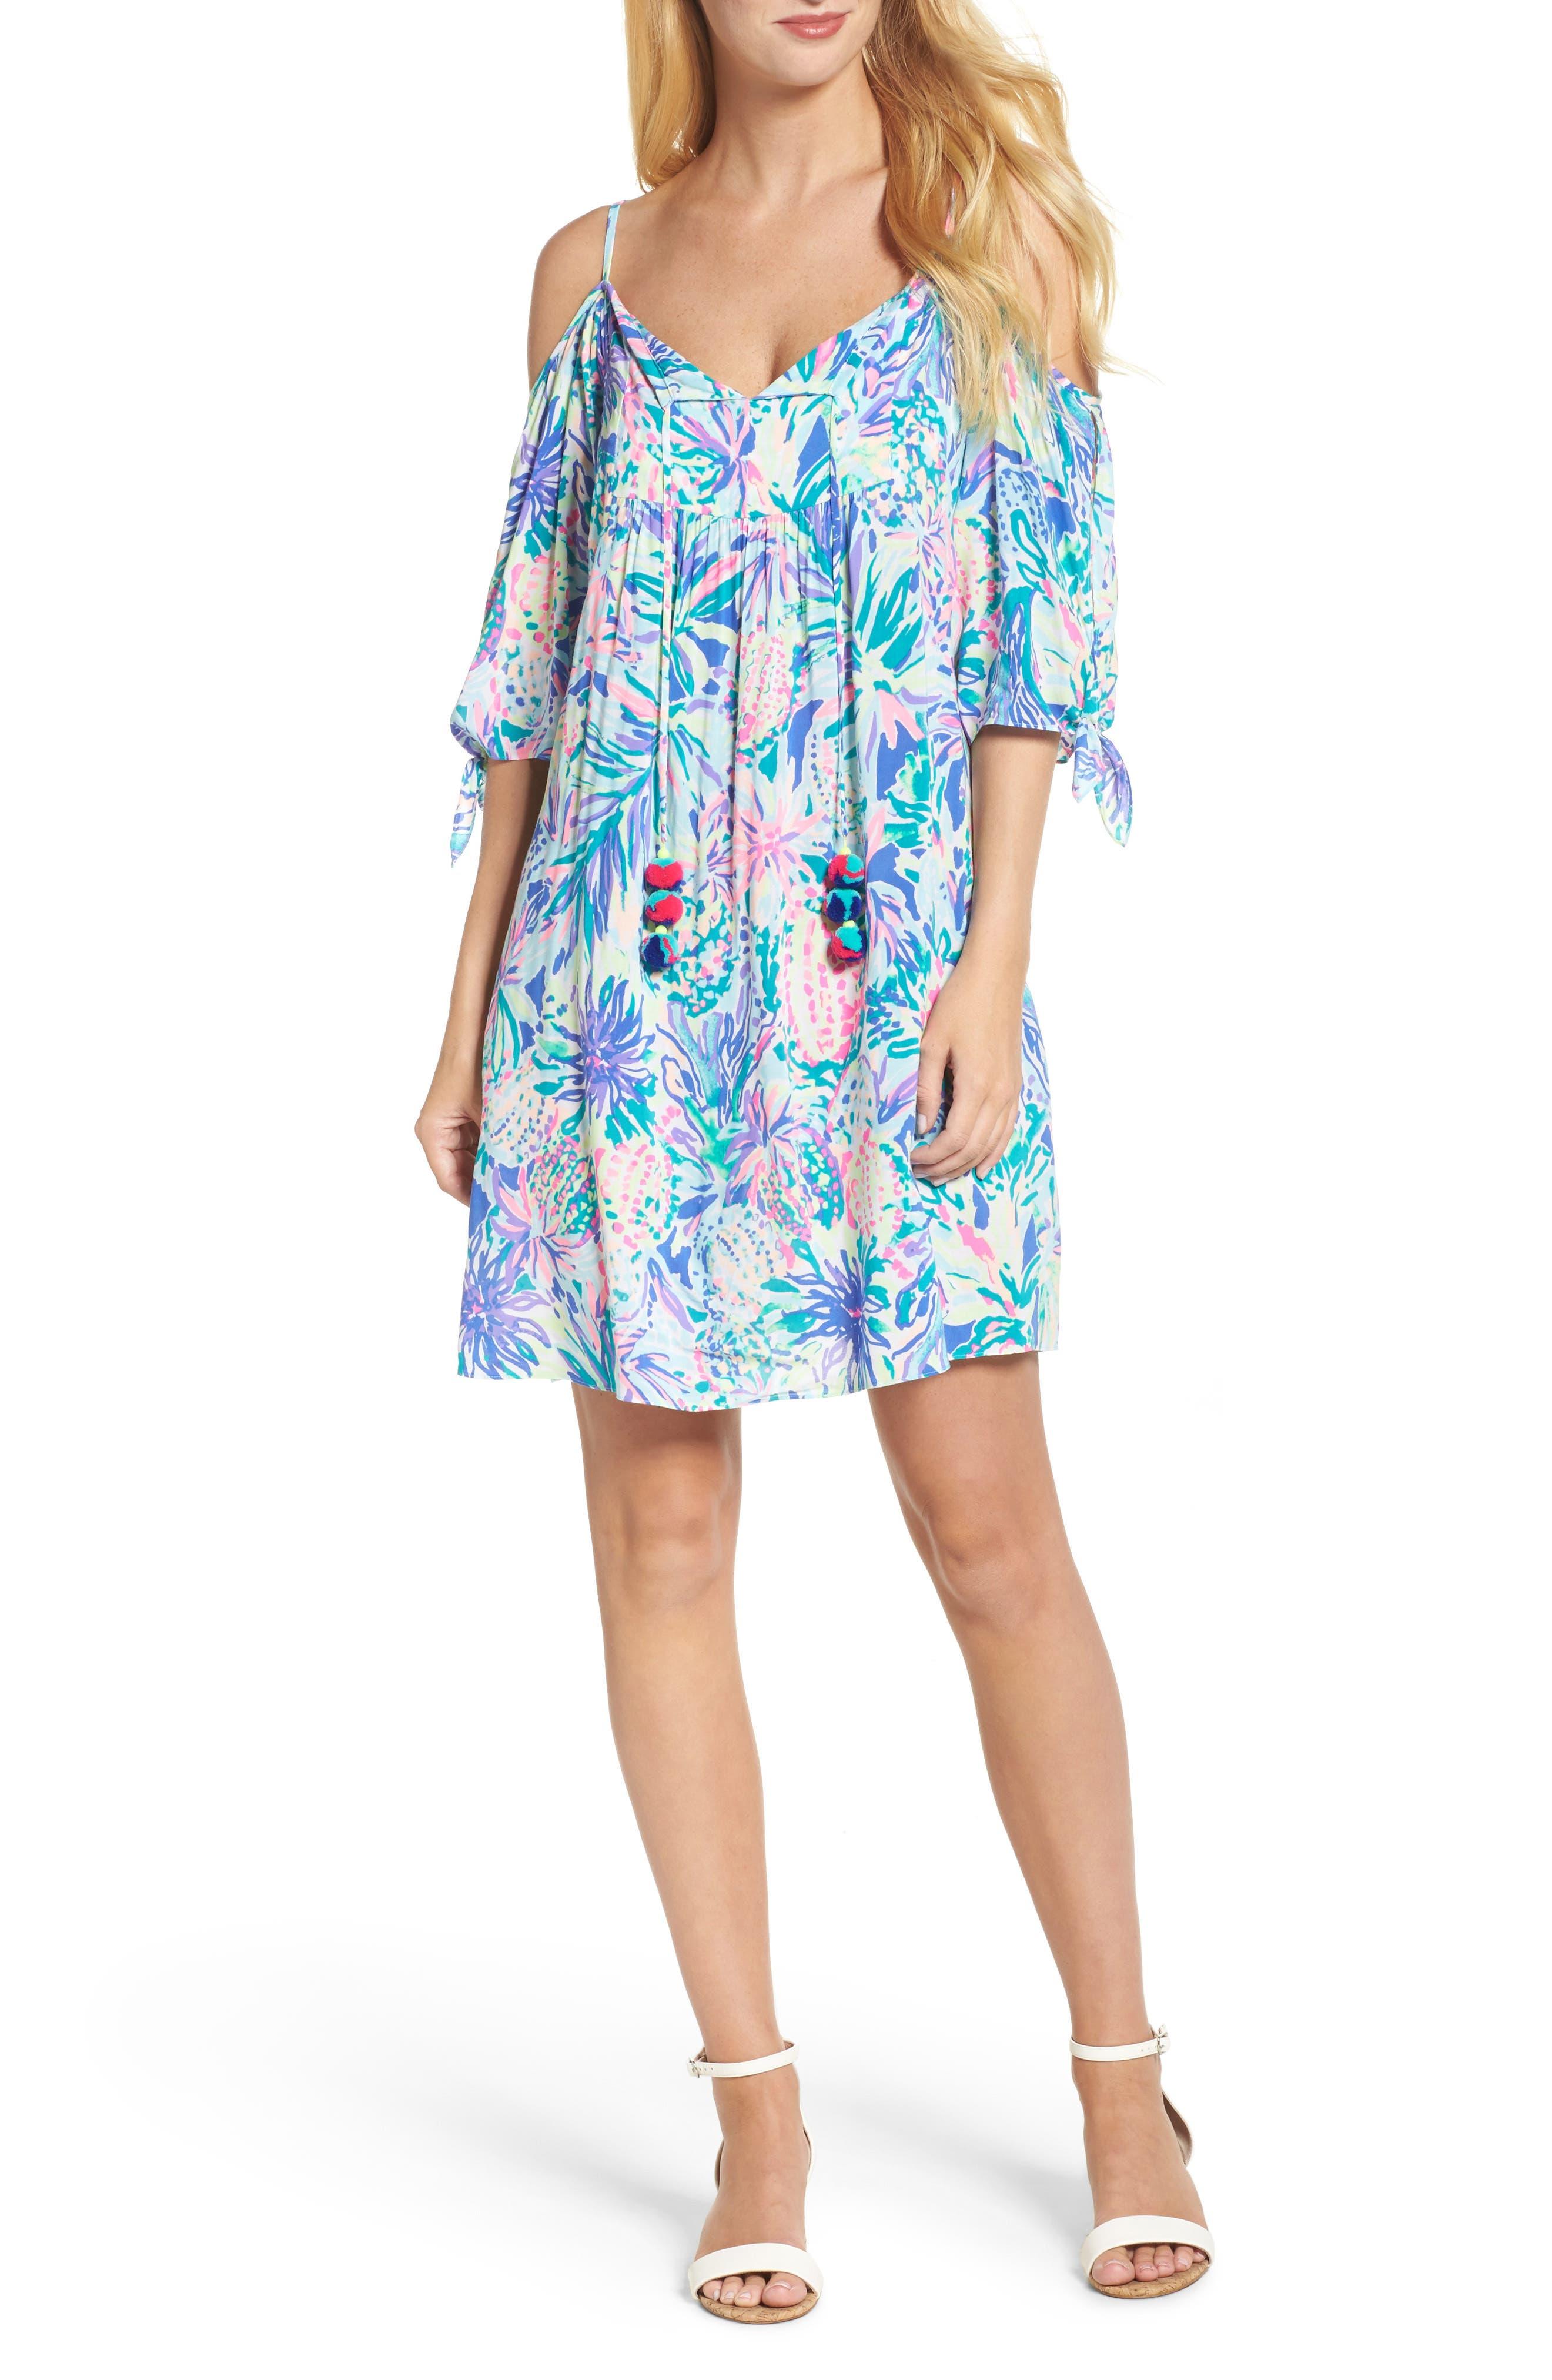 Lilly Pulitzer® Alanna Cold Shoulder Dress